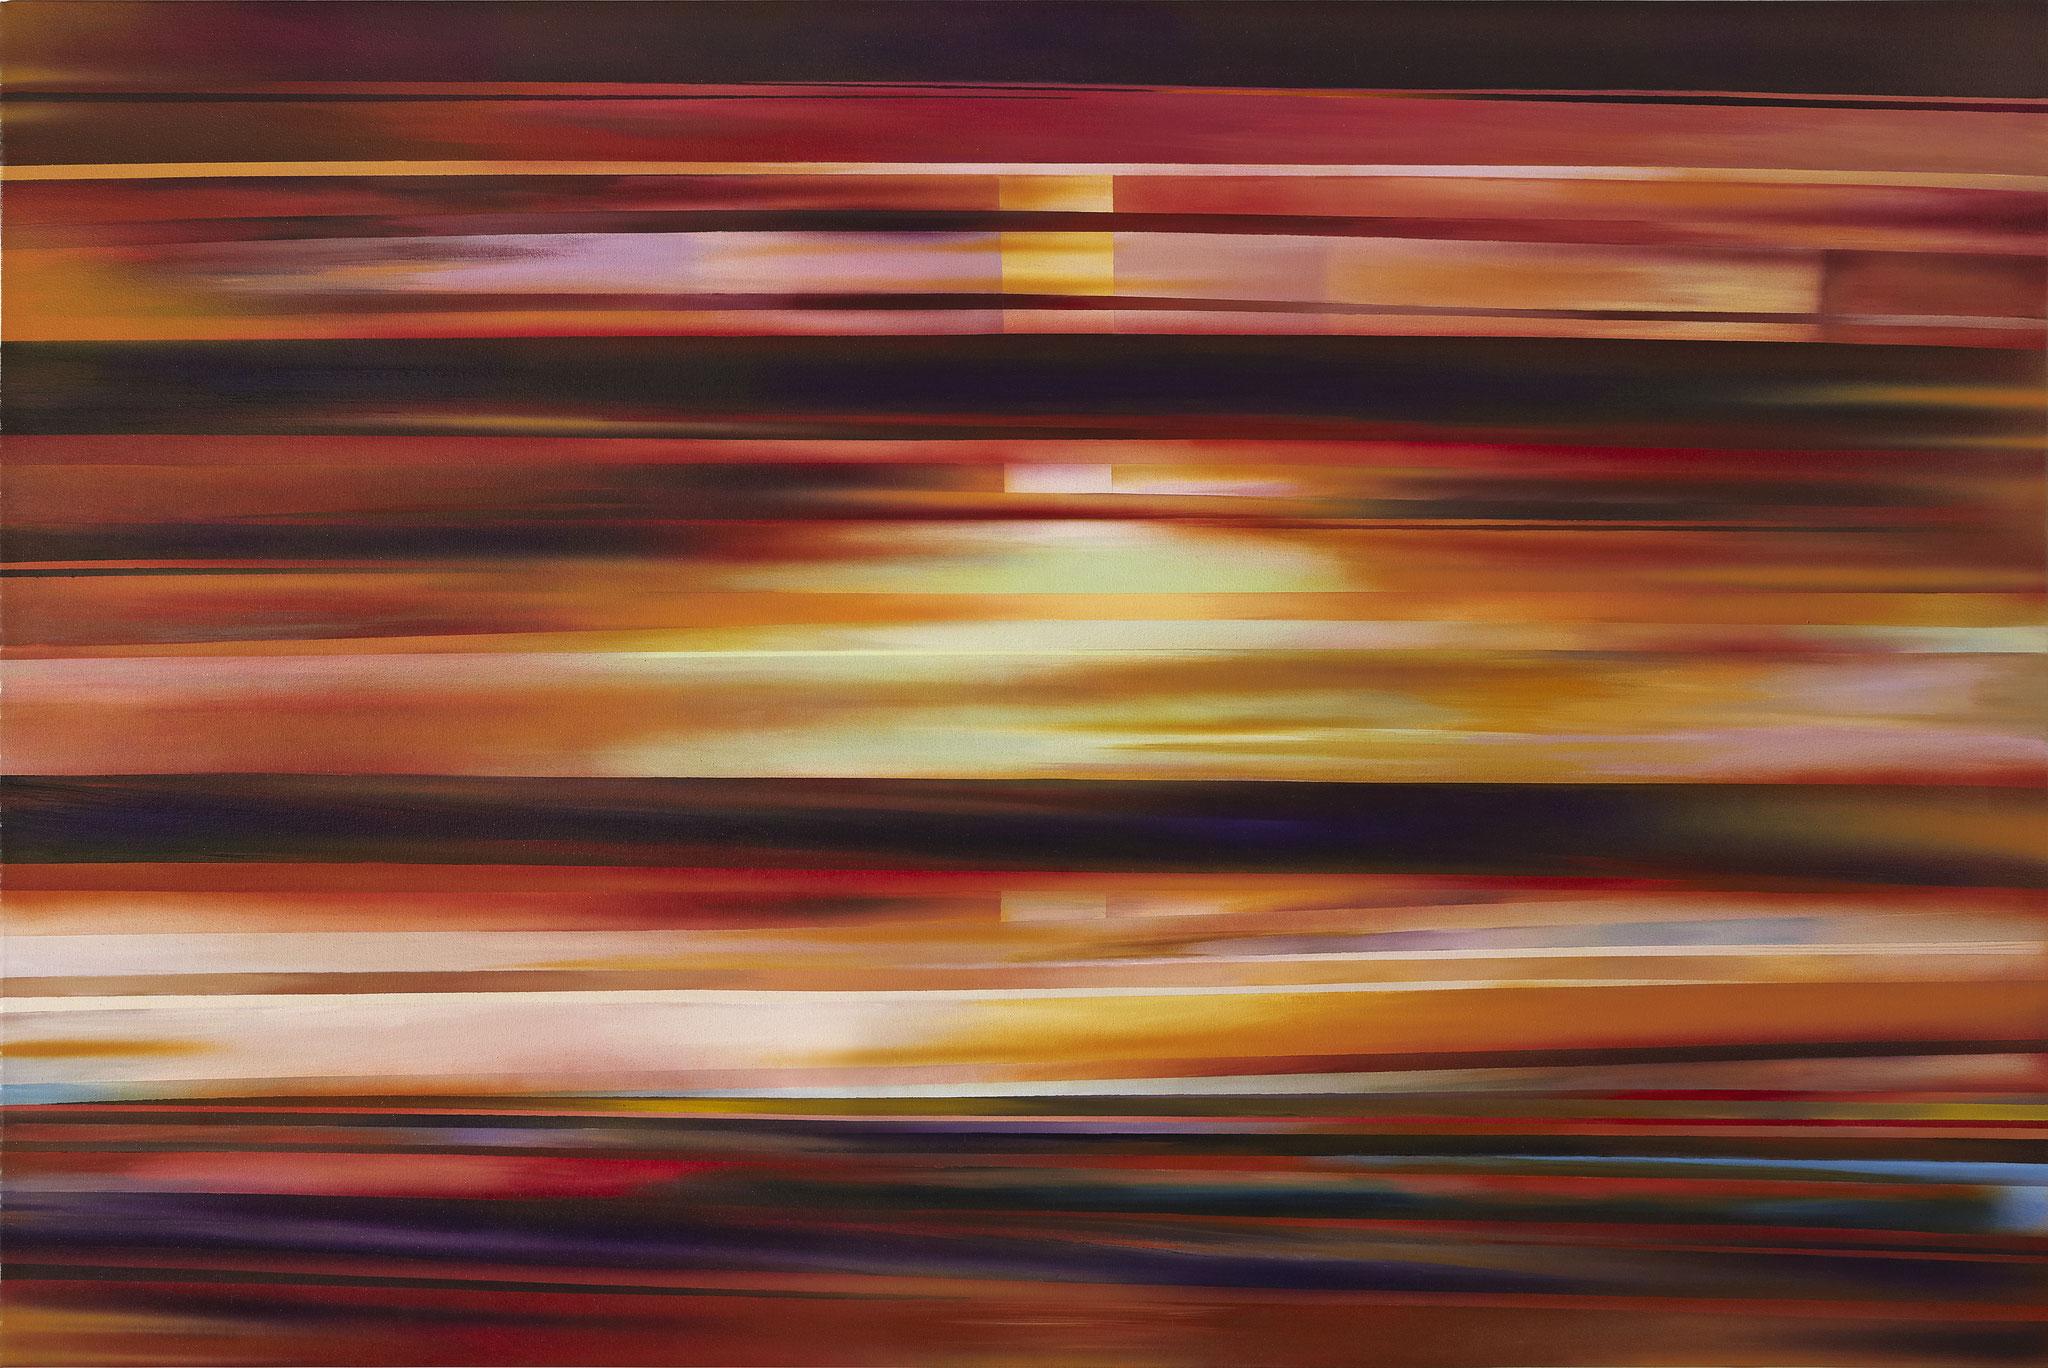 Movimento 133 cm x 200 cm Acryl auf Leinwand 2012